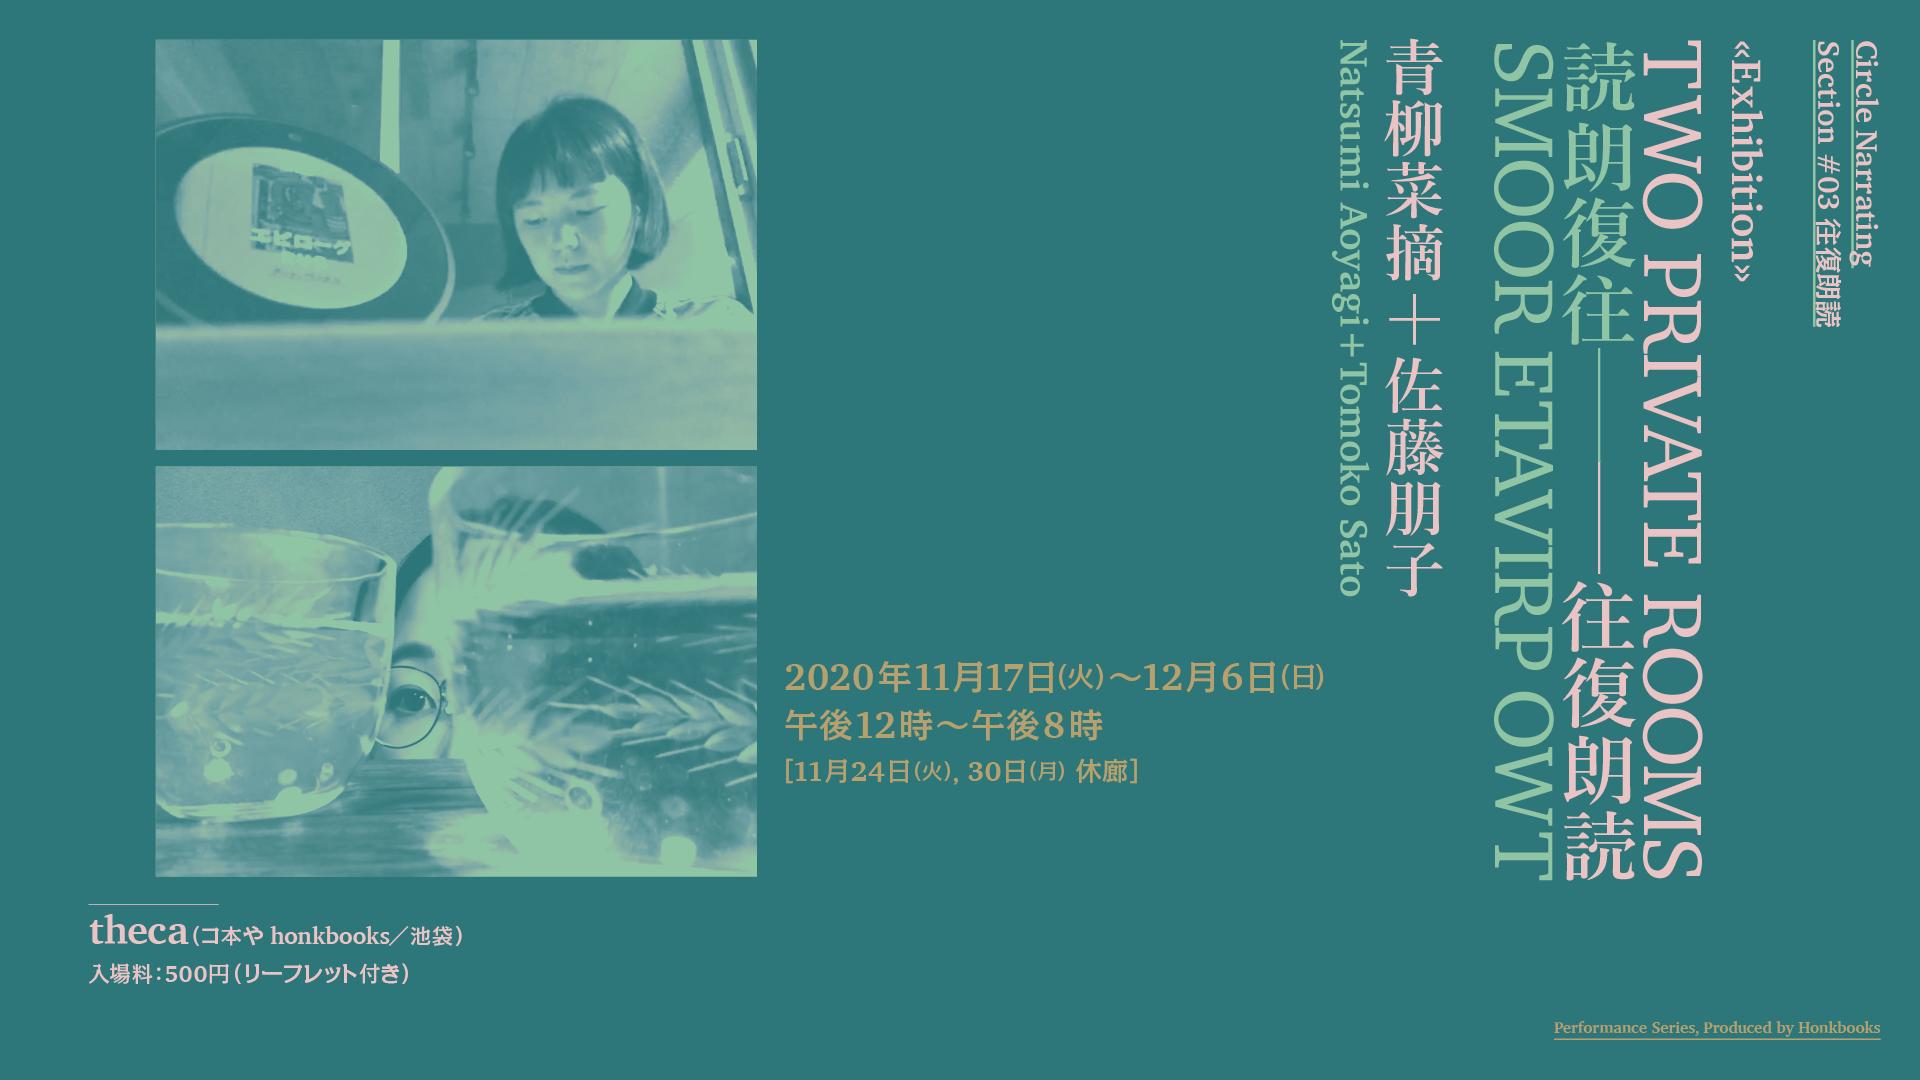 「TWO PRIVATE ROOMS – 往復朗読」イベントアーカイブ視聴+リーフレット販売